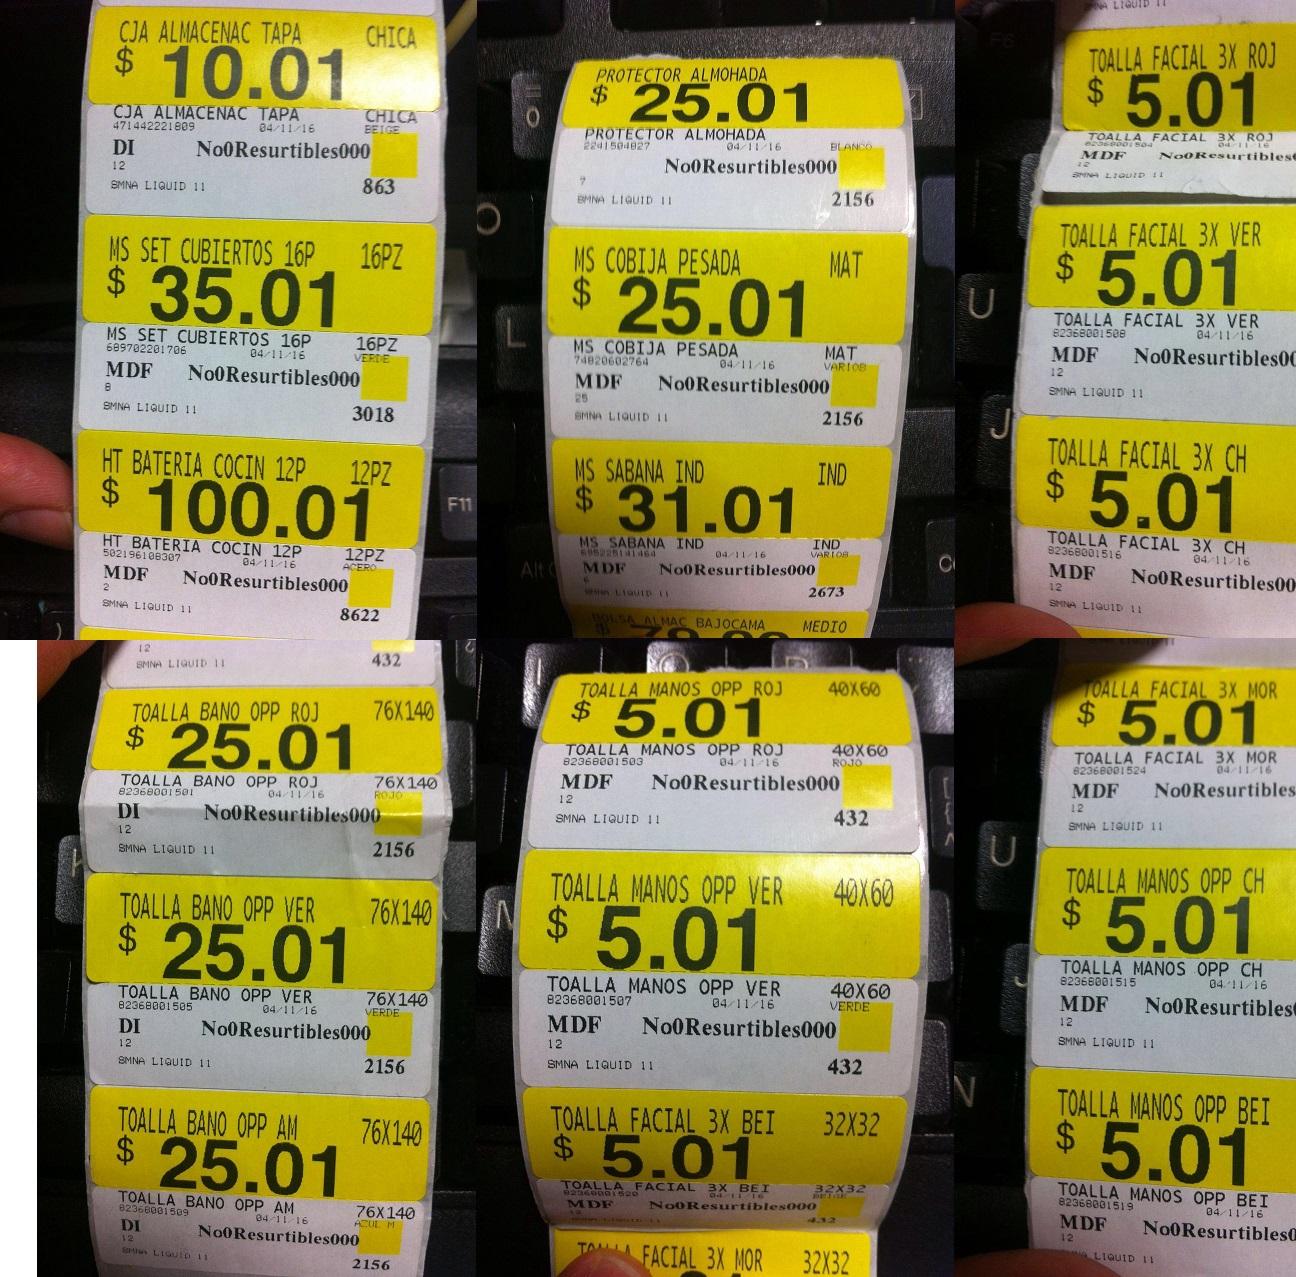 Walmart: Bateria 12p, Protector de Almohada, Cobija, Sabana, Toallas